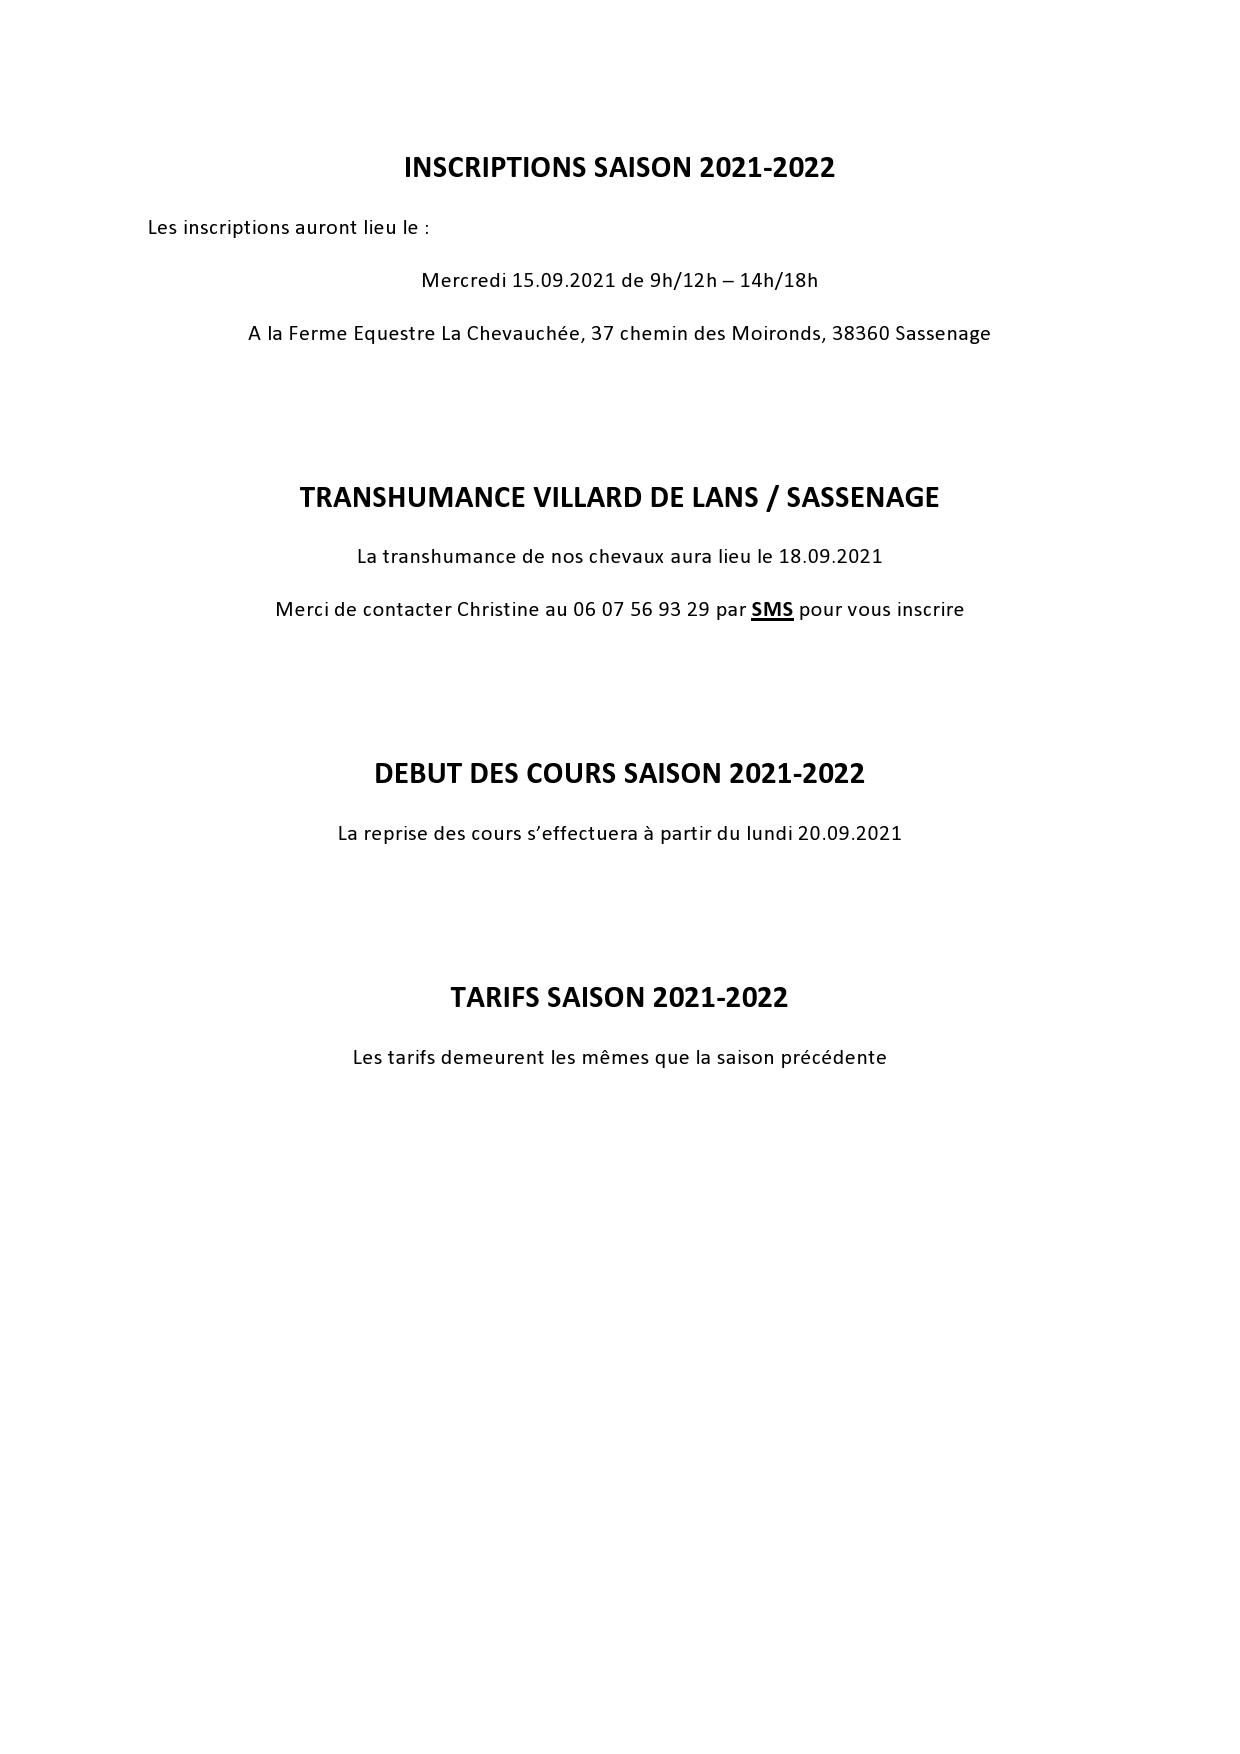 Info_diverses2021_2022-inscript-transhumance-debut_cours.jpg